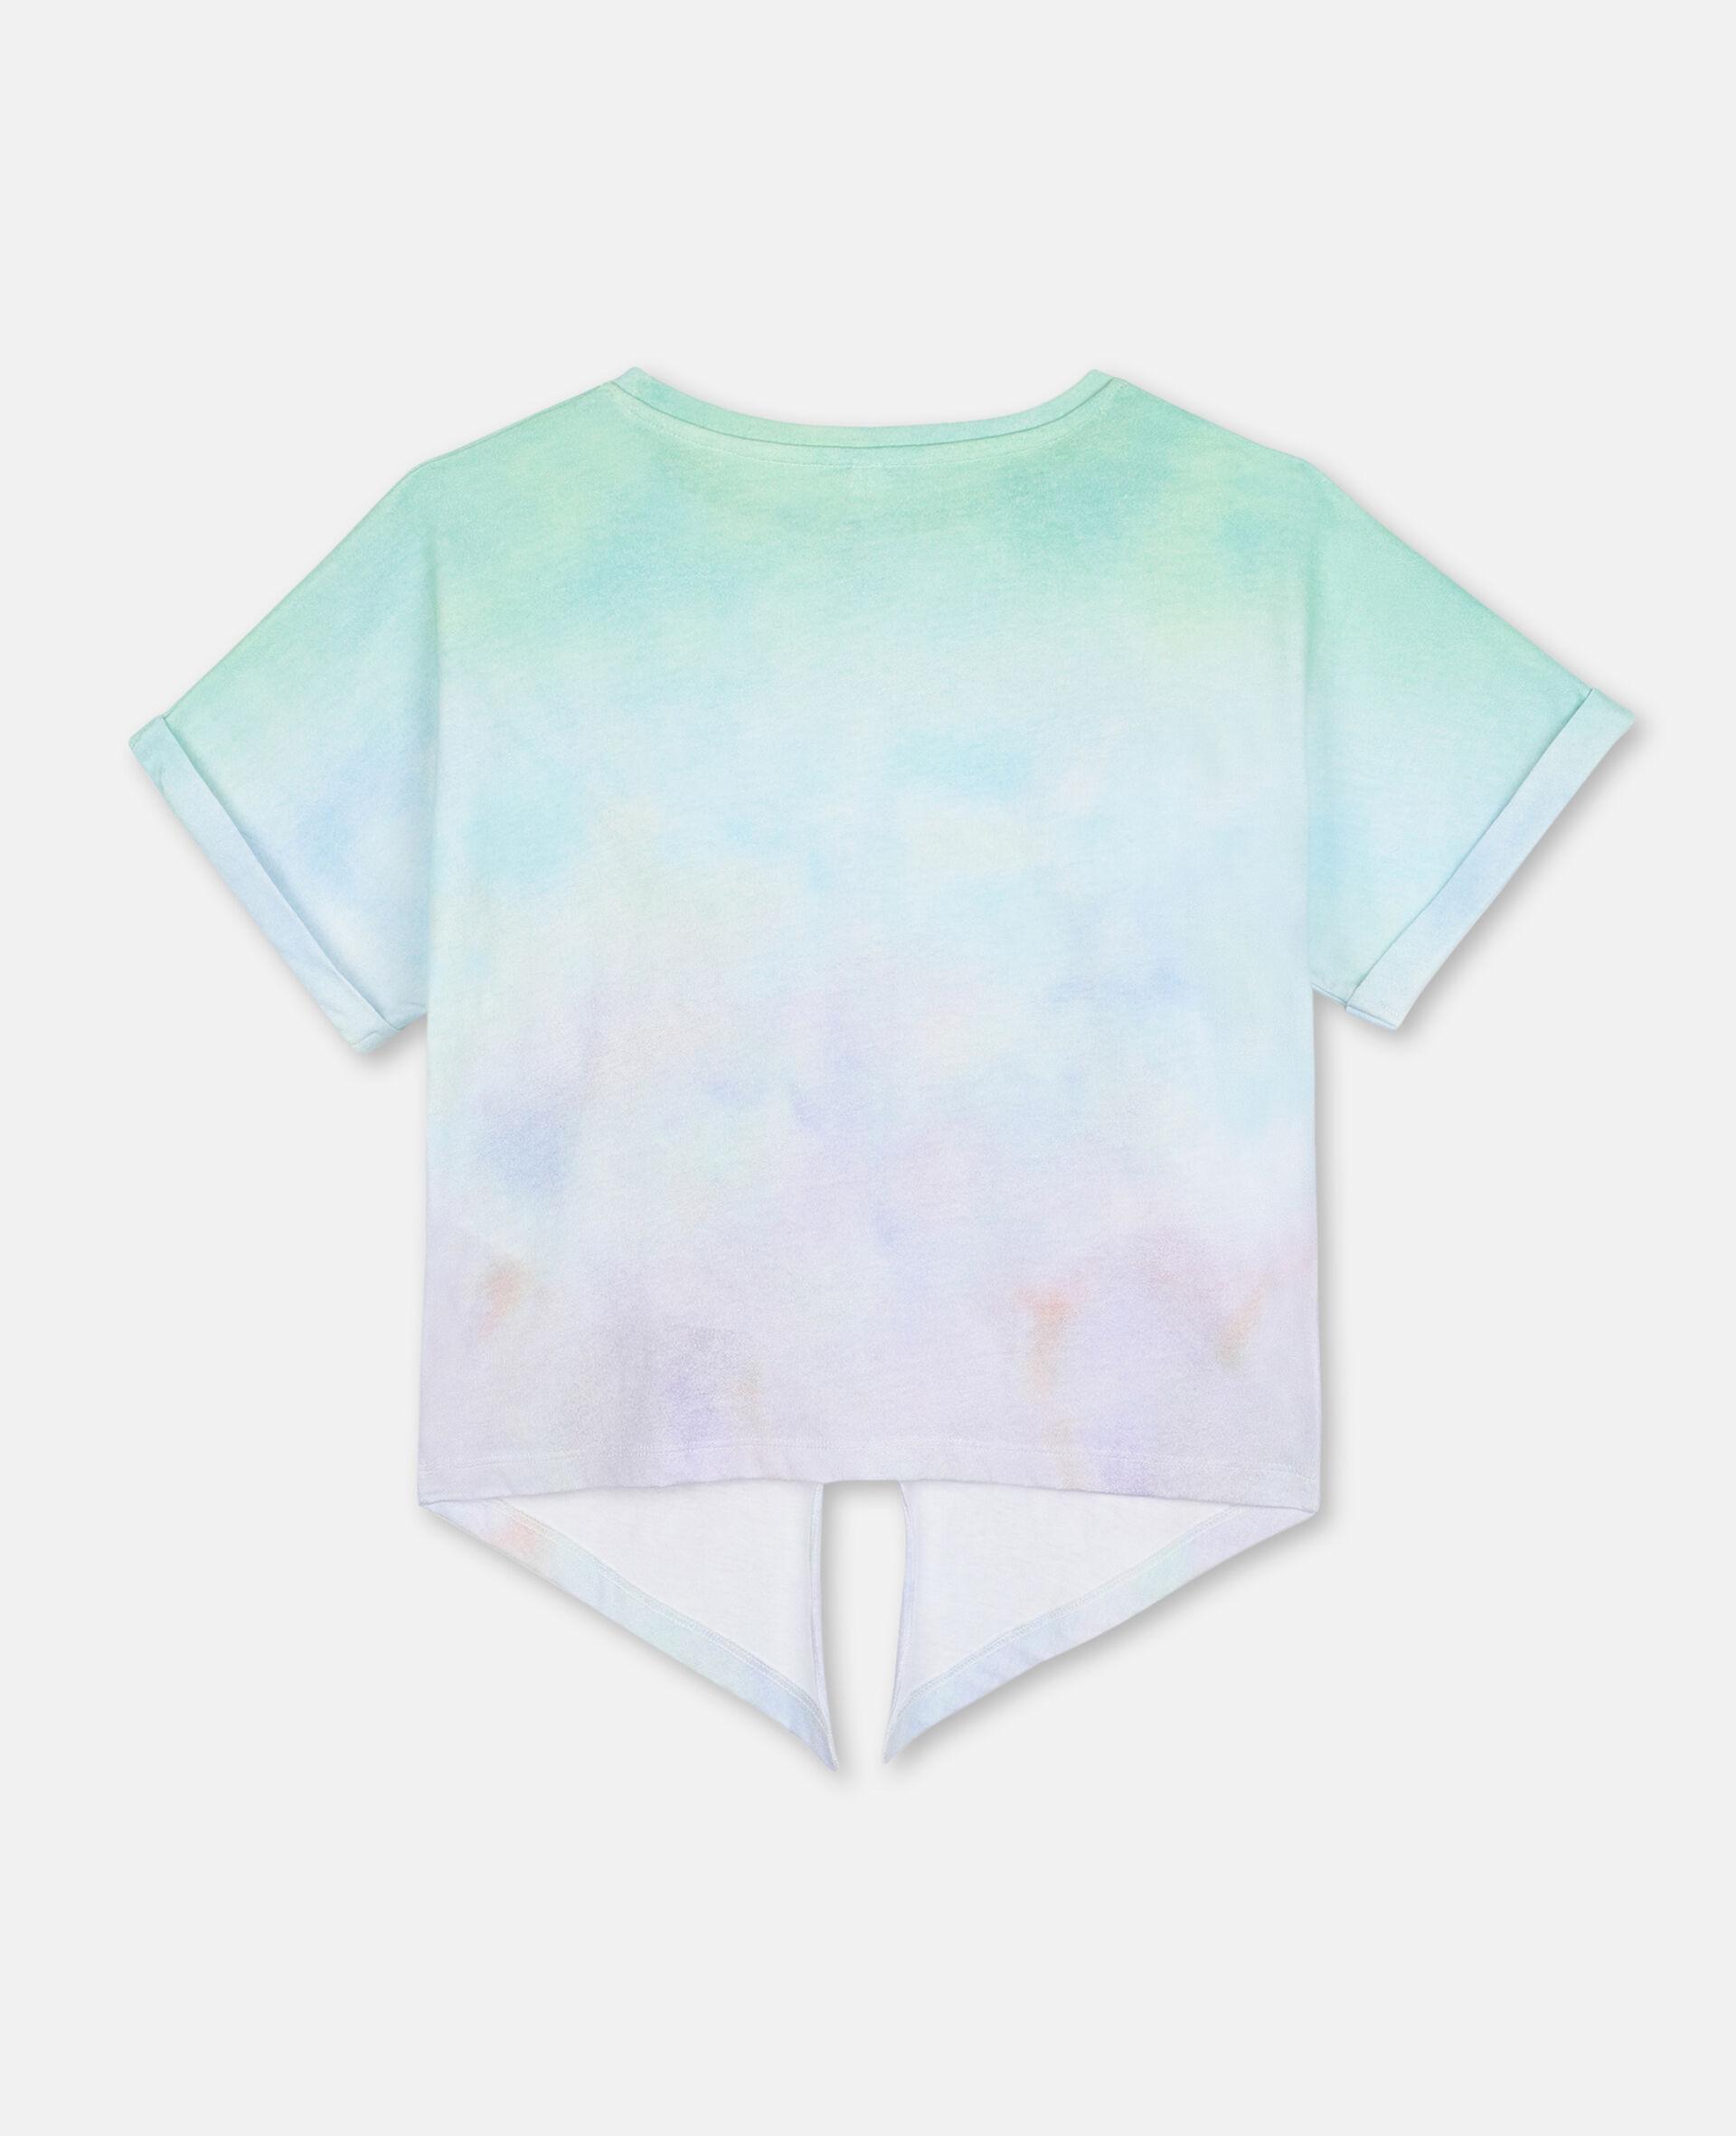 Baumwoll-T-Shirt mit Schmetterling-Print-Bunt-large image number 3